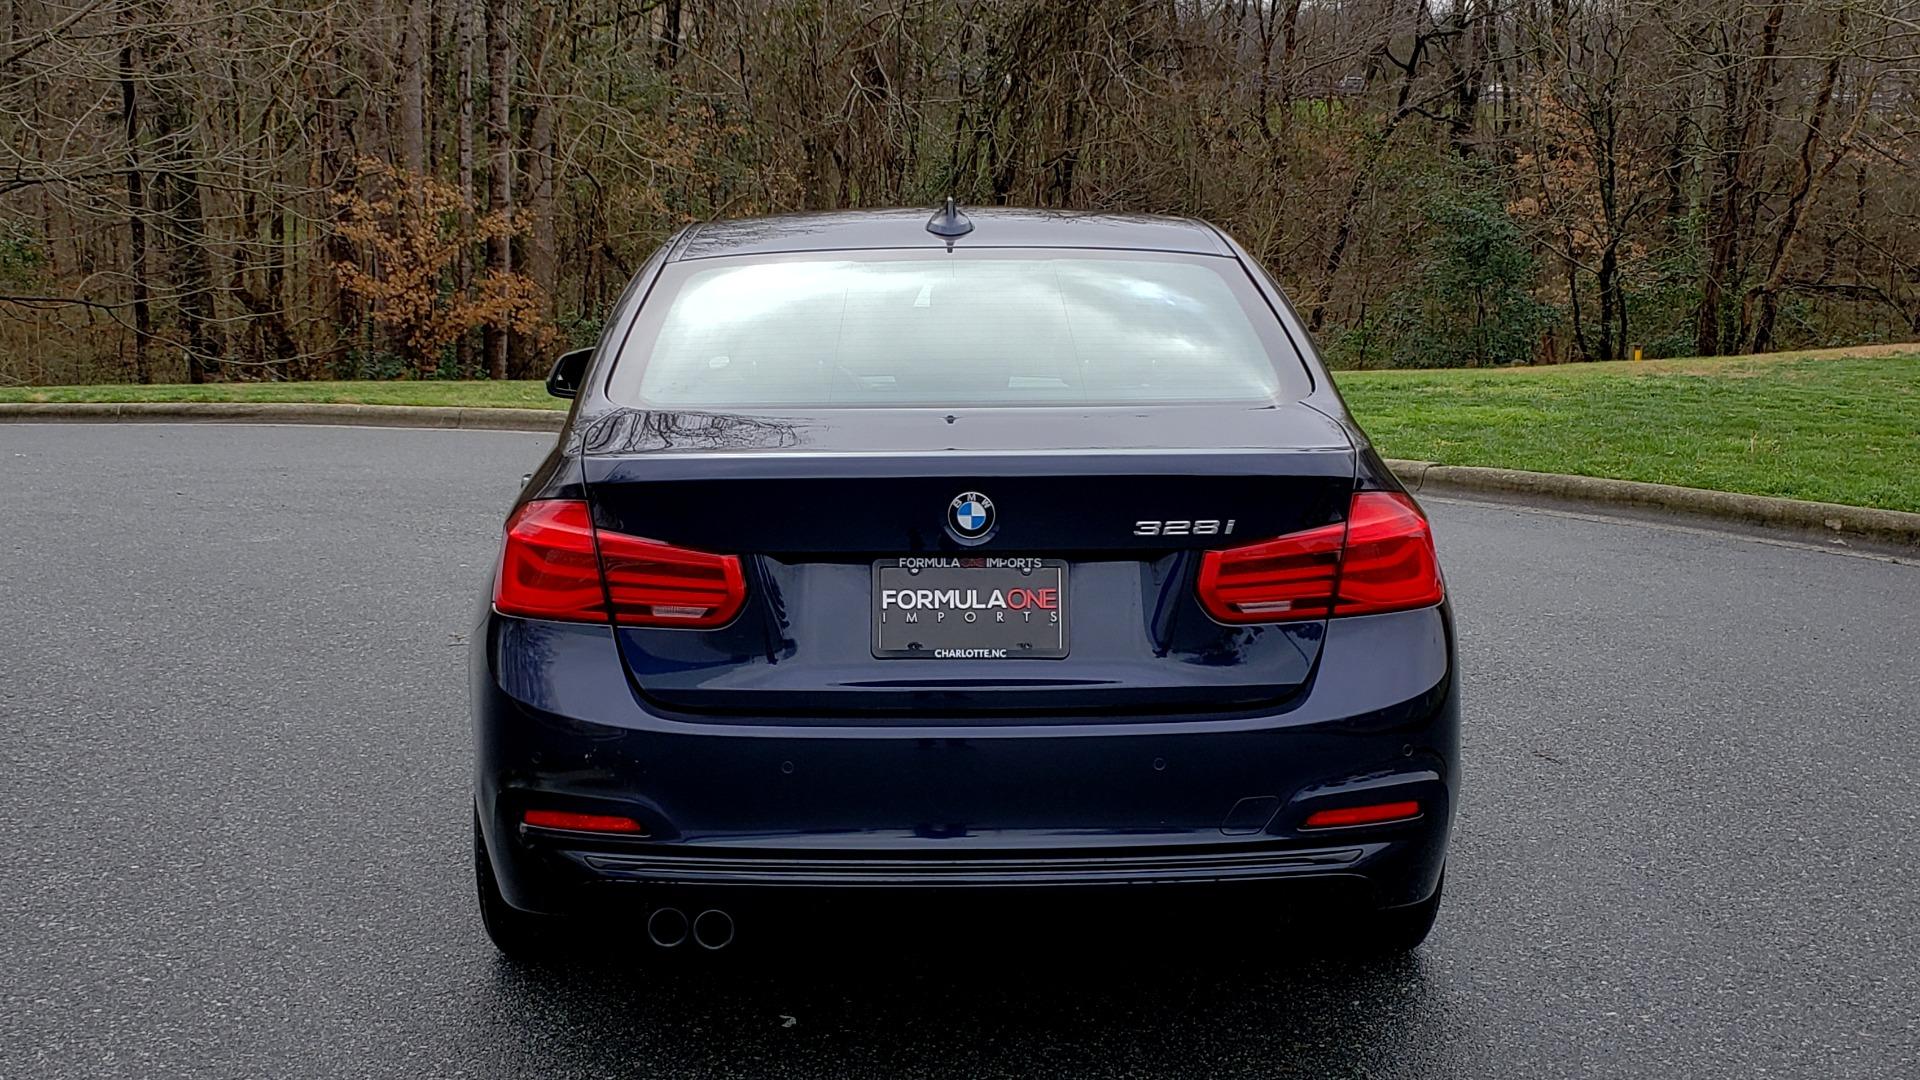 Used 2016 BMW 3 SERIES 328I PREMIUM PKG / DRVR ASST / SUNROOF / PARK ASST for sale Sold at Formula Imports in Charlotte NC 28227 26